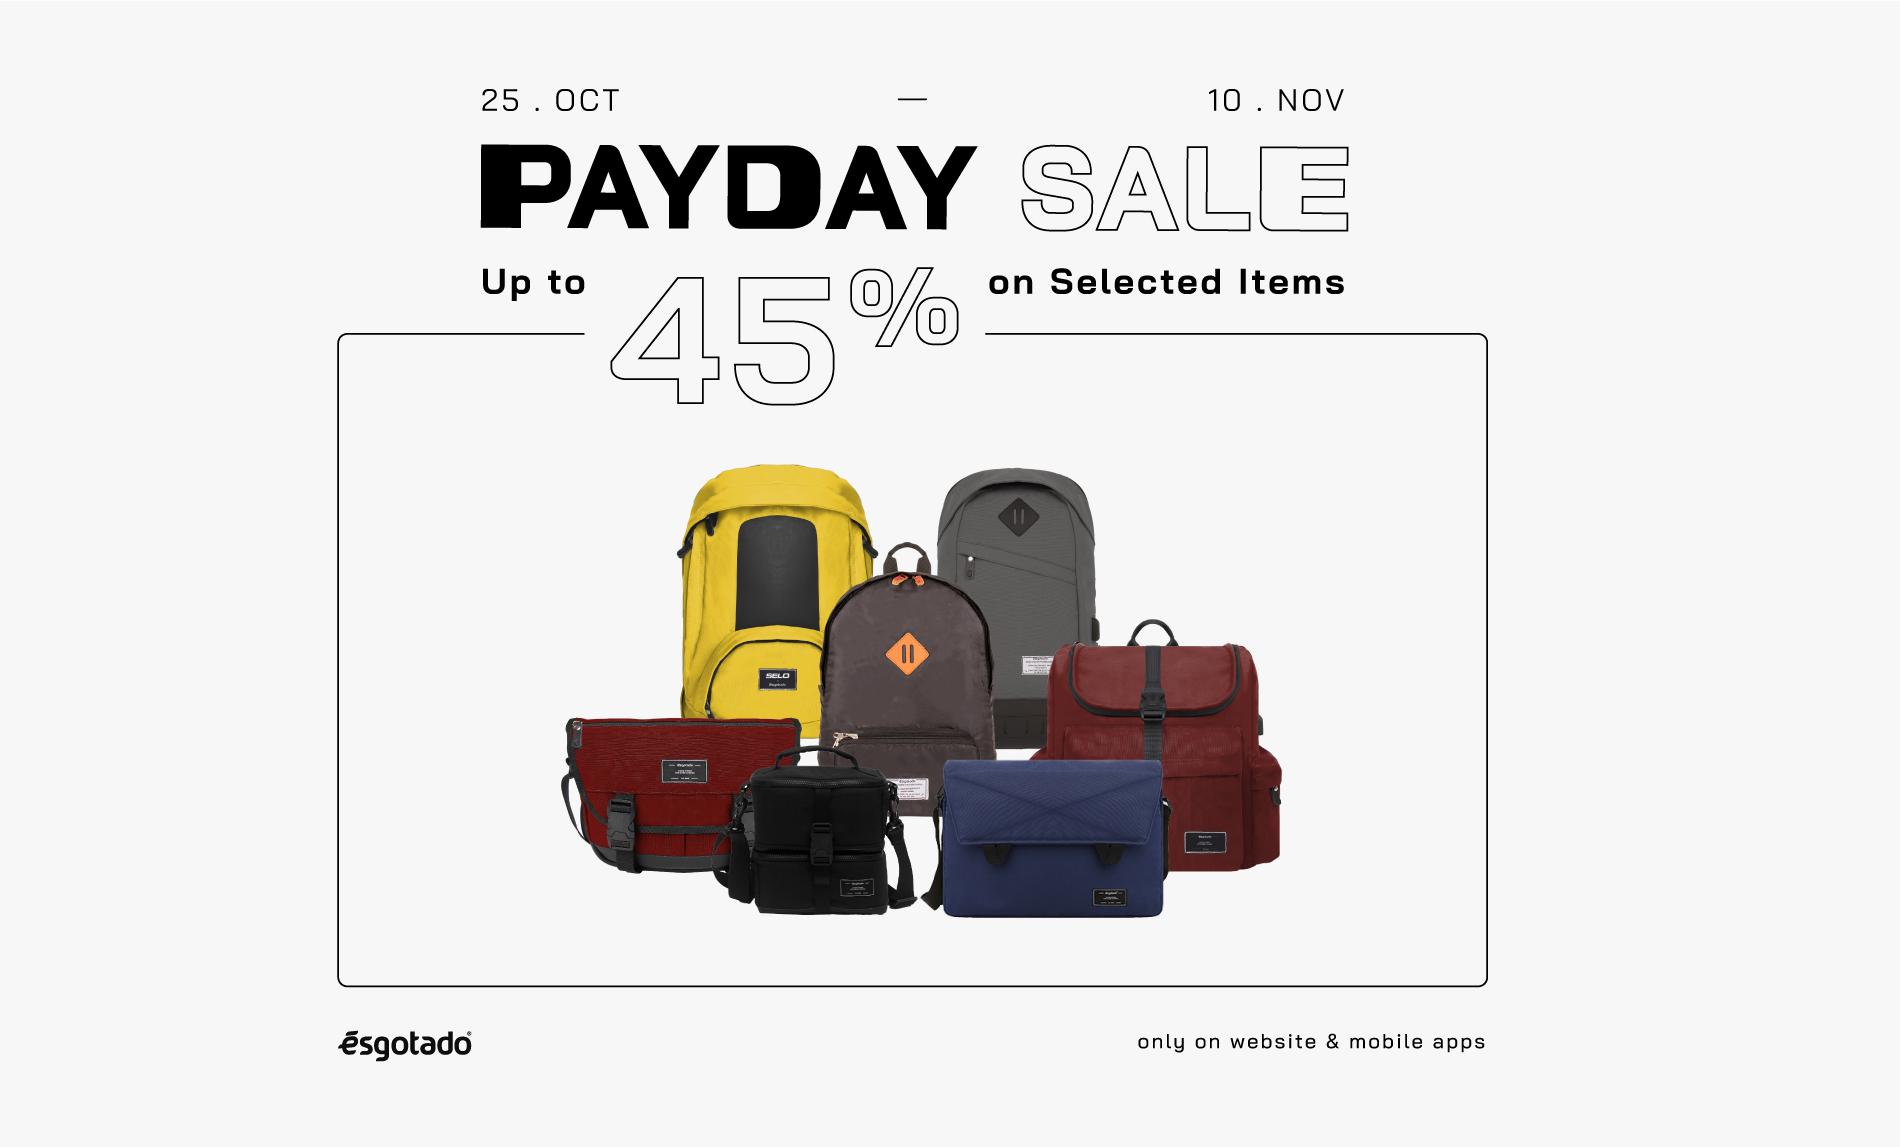 payday sale oktober november